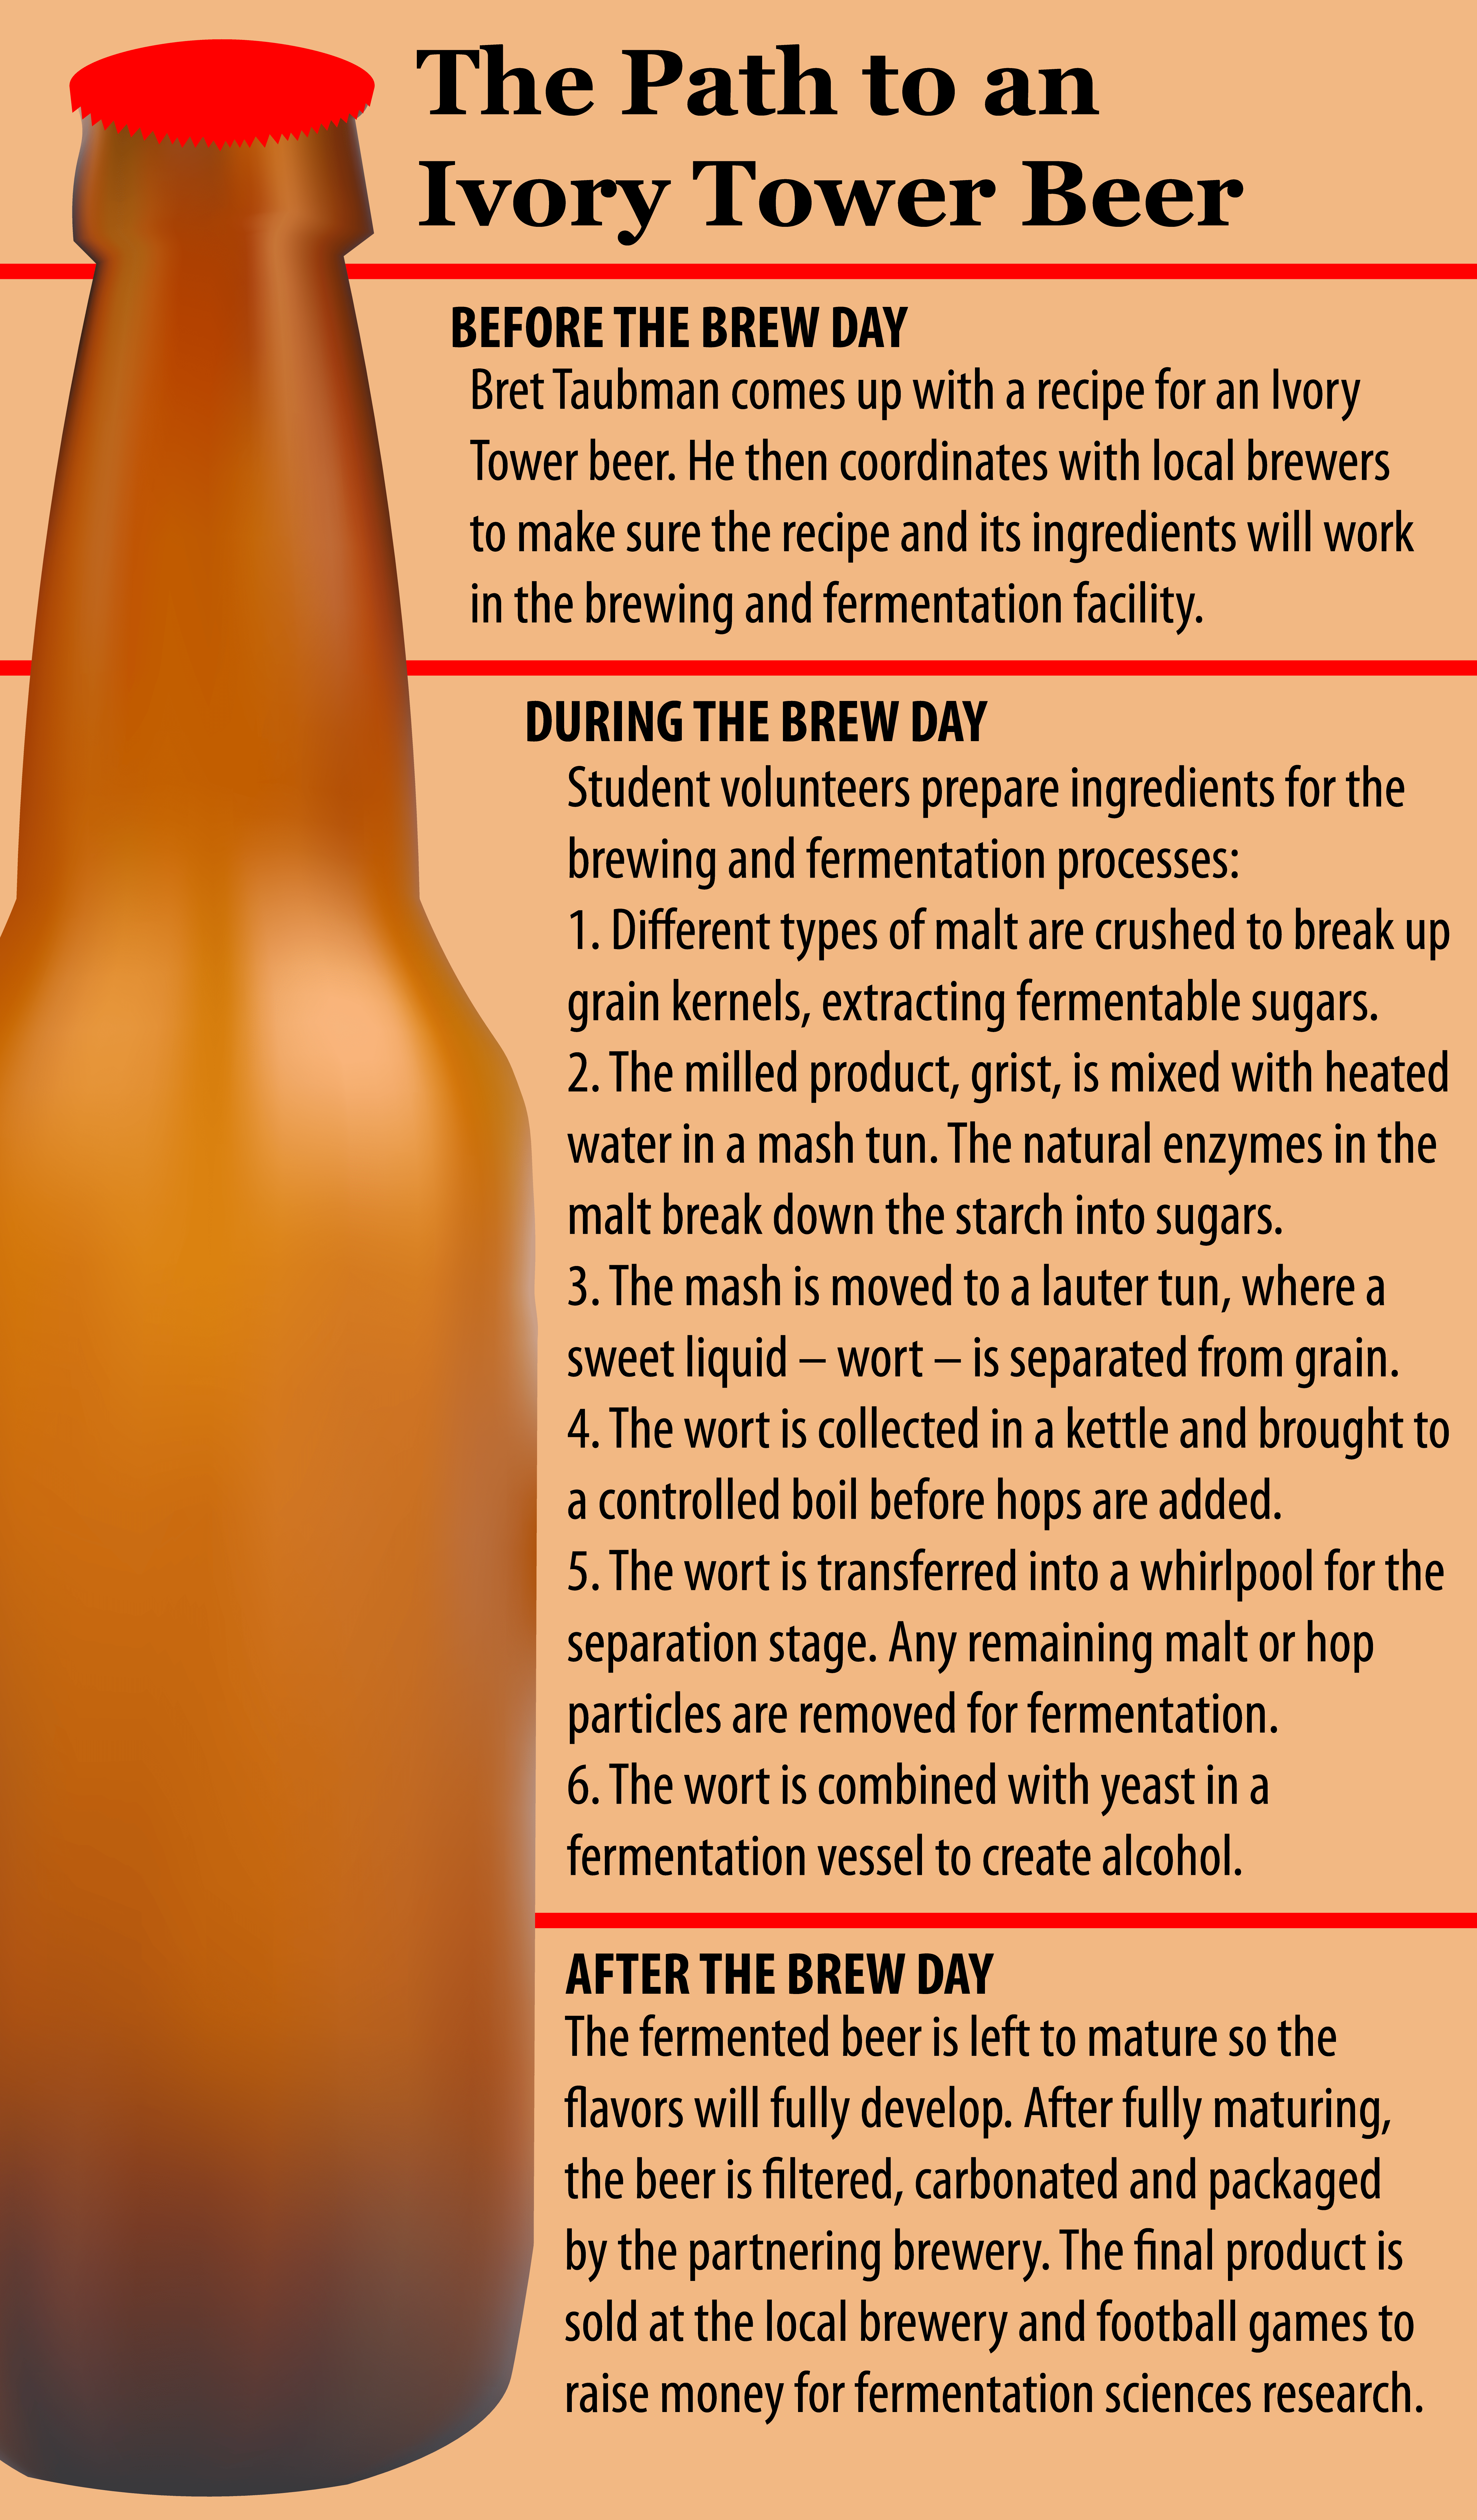 Graphic describing the beer brewing process